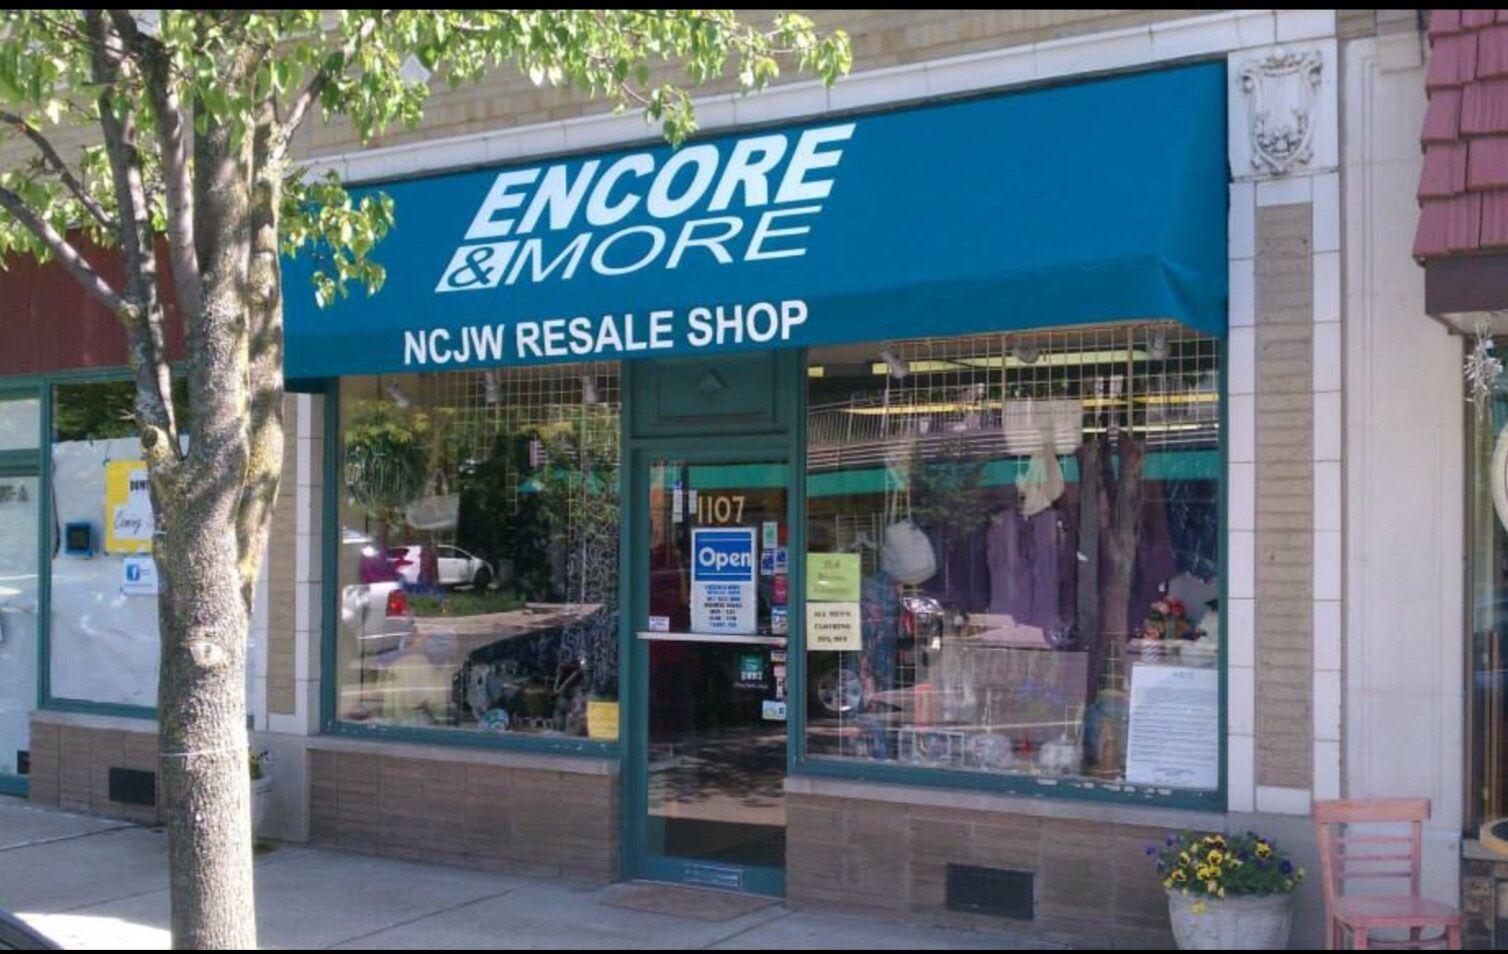 Encore&More